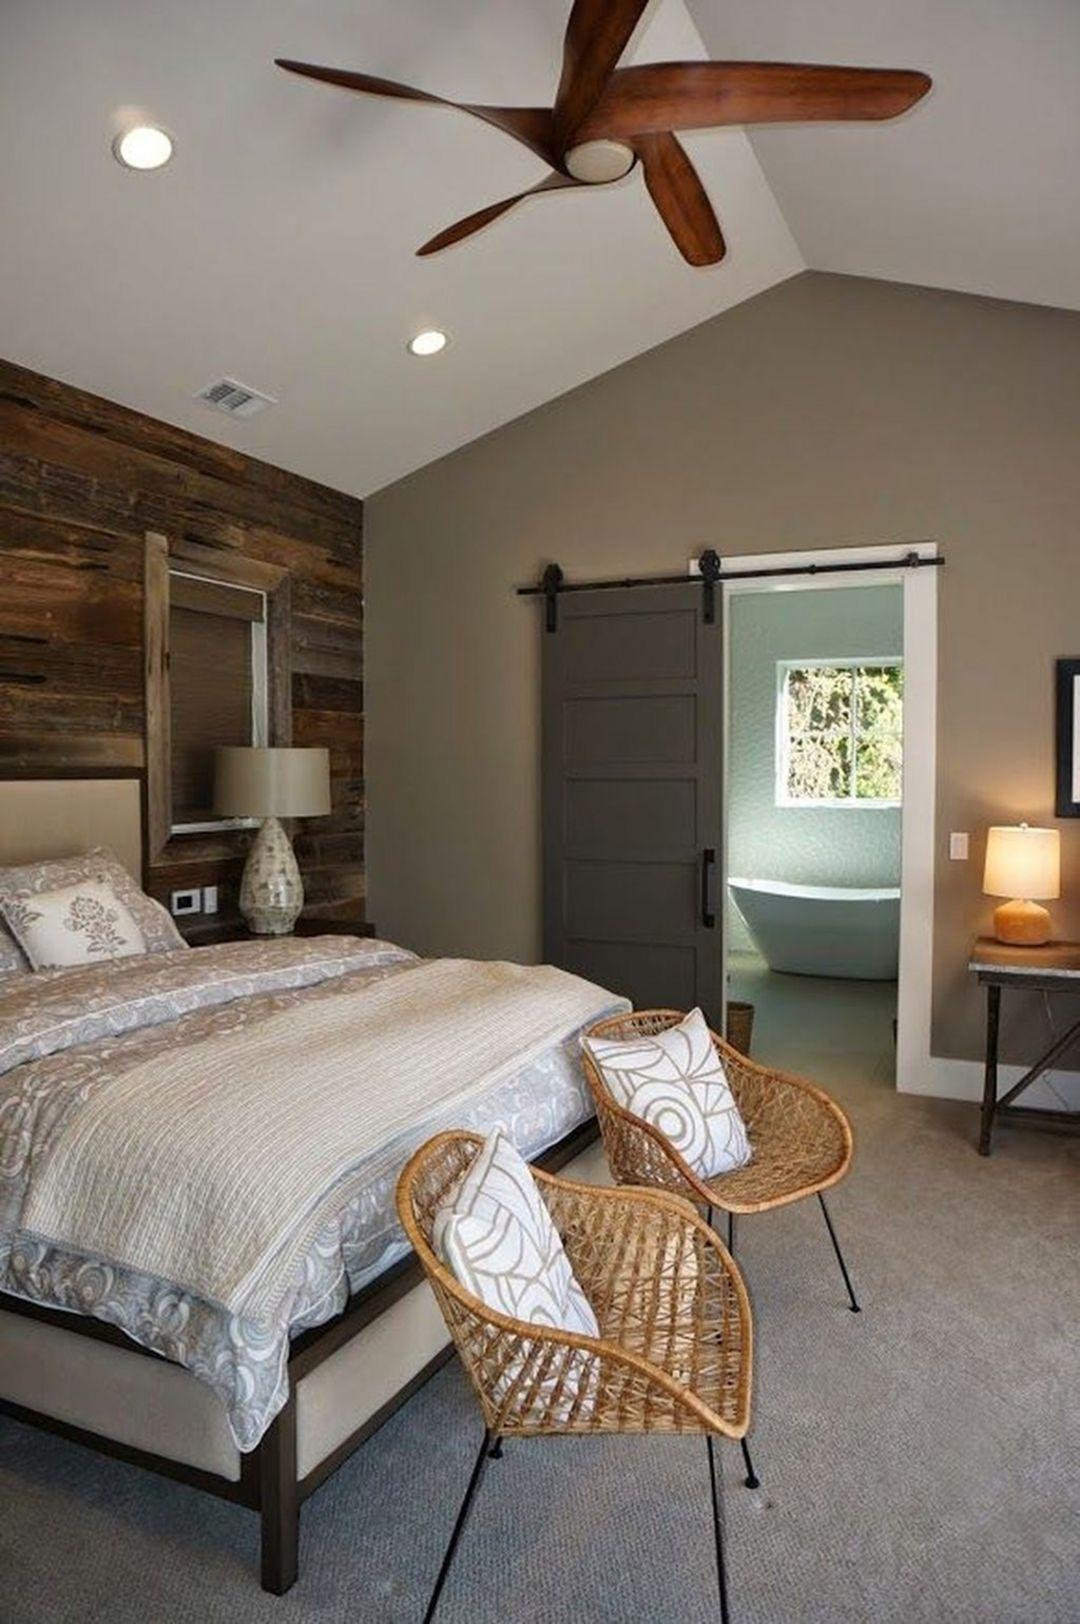 15 Amazing Farmhouse Master Bedroom Design Ideas for Your Sleep Comfort